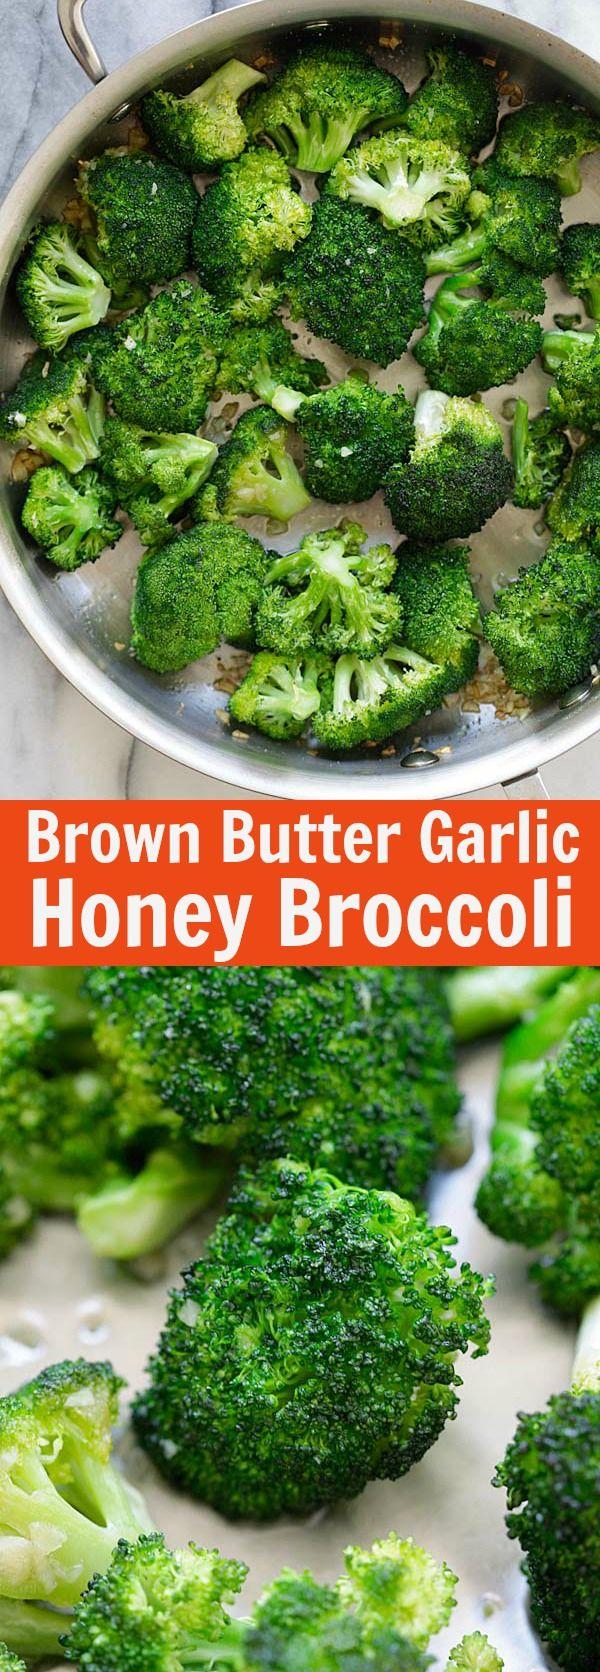 Brown Butter Garlic Honey Roasted Broccoli – dress up plain roasted broccoli with brown butter, garlic and honey. Broccoli has never tasted this good | rasamalaysia.com